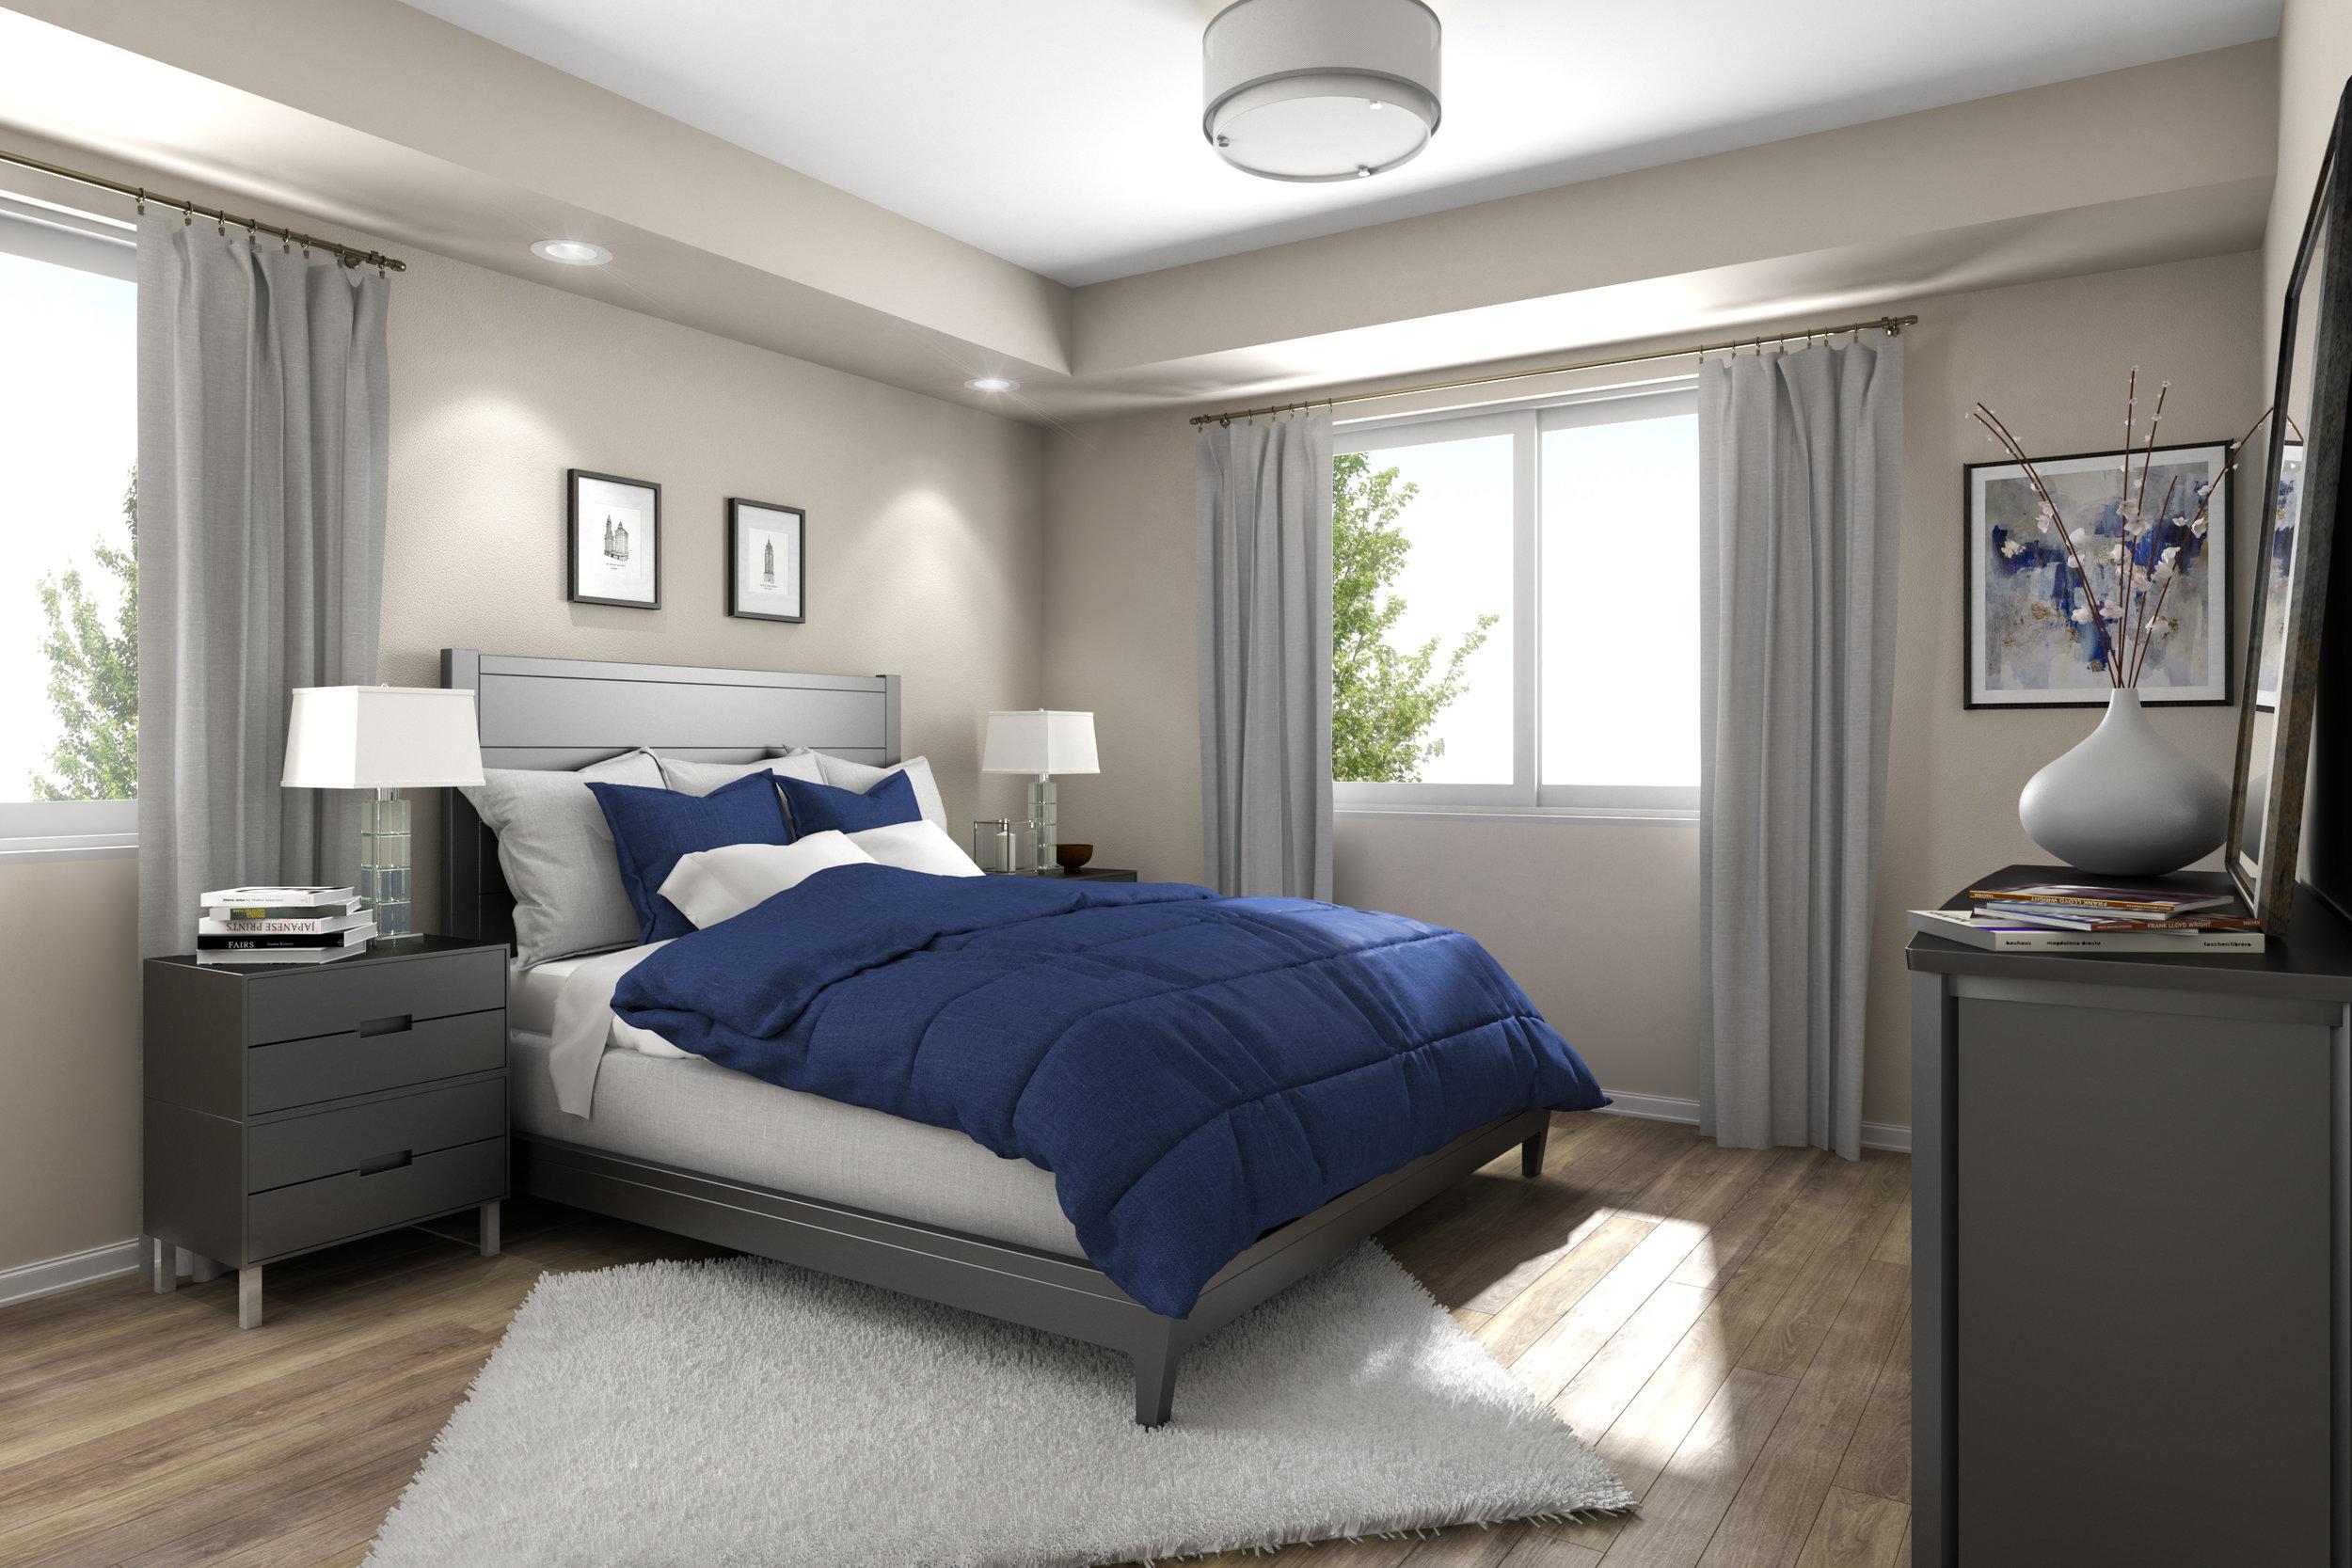 168_View 01_Bedroom.jpg